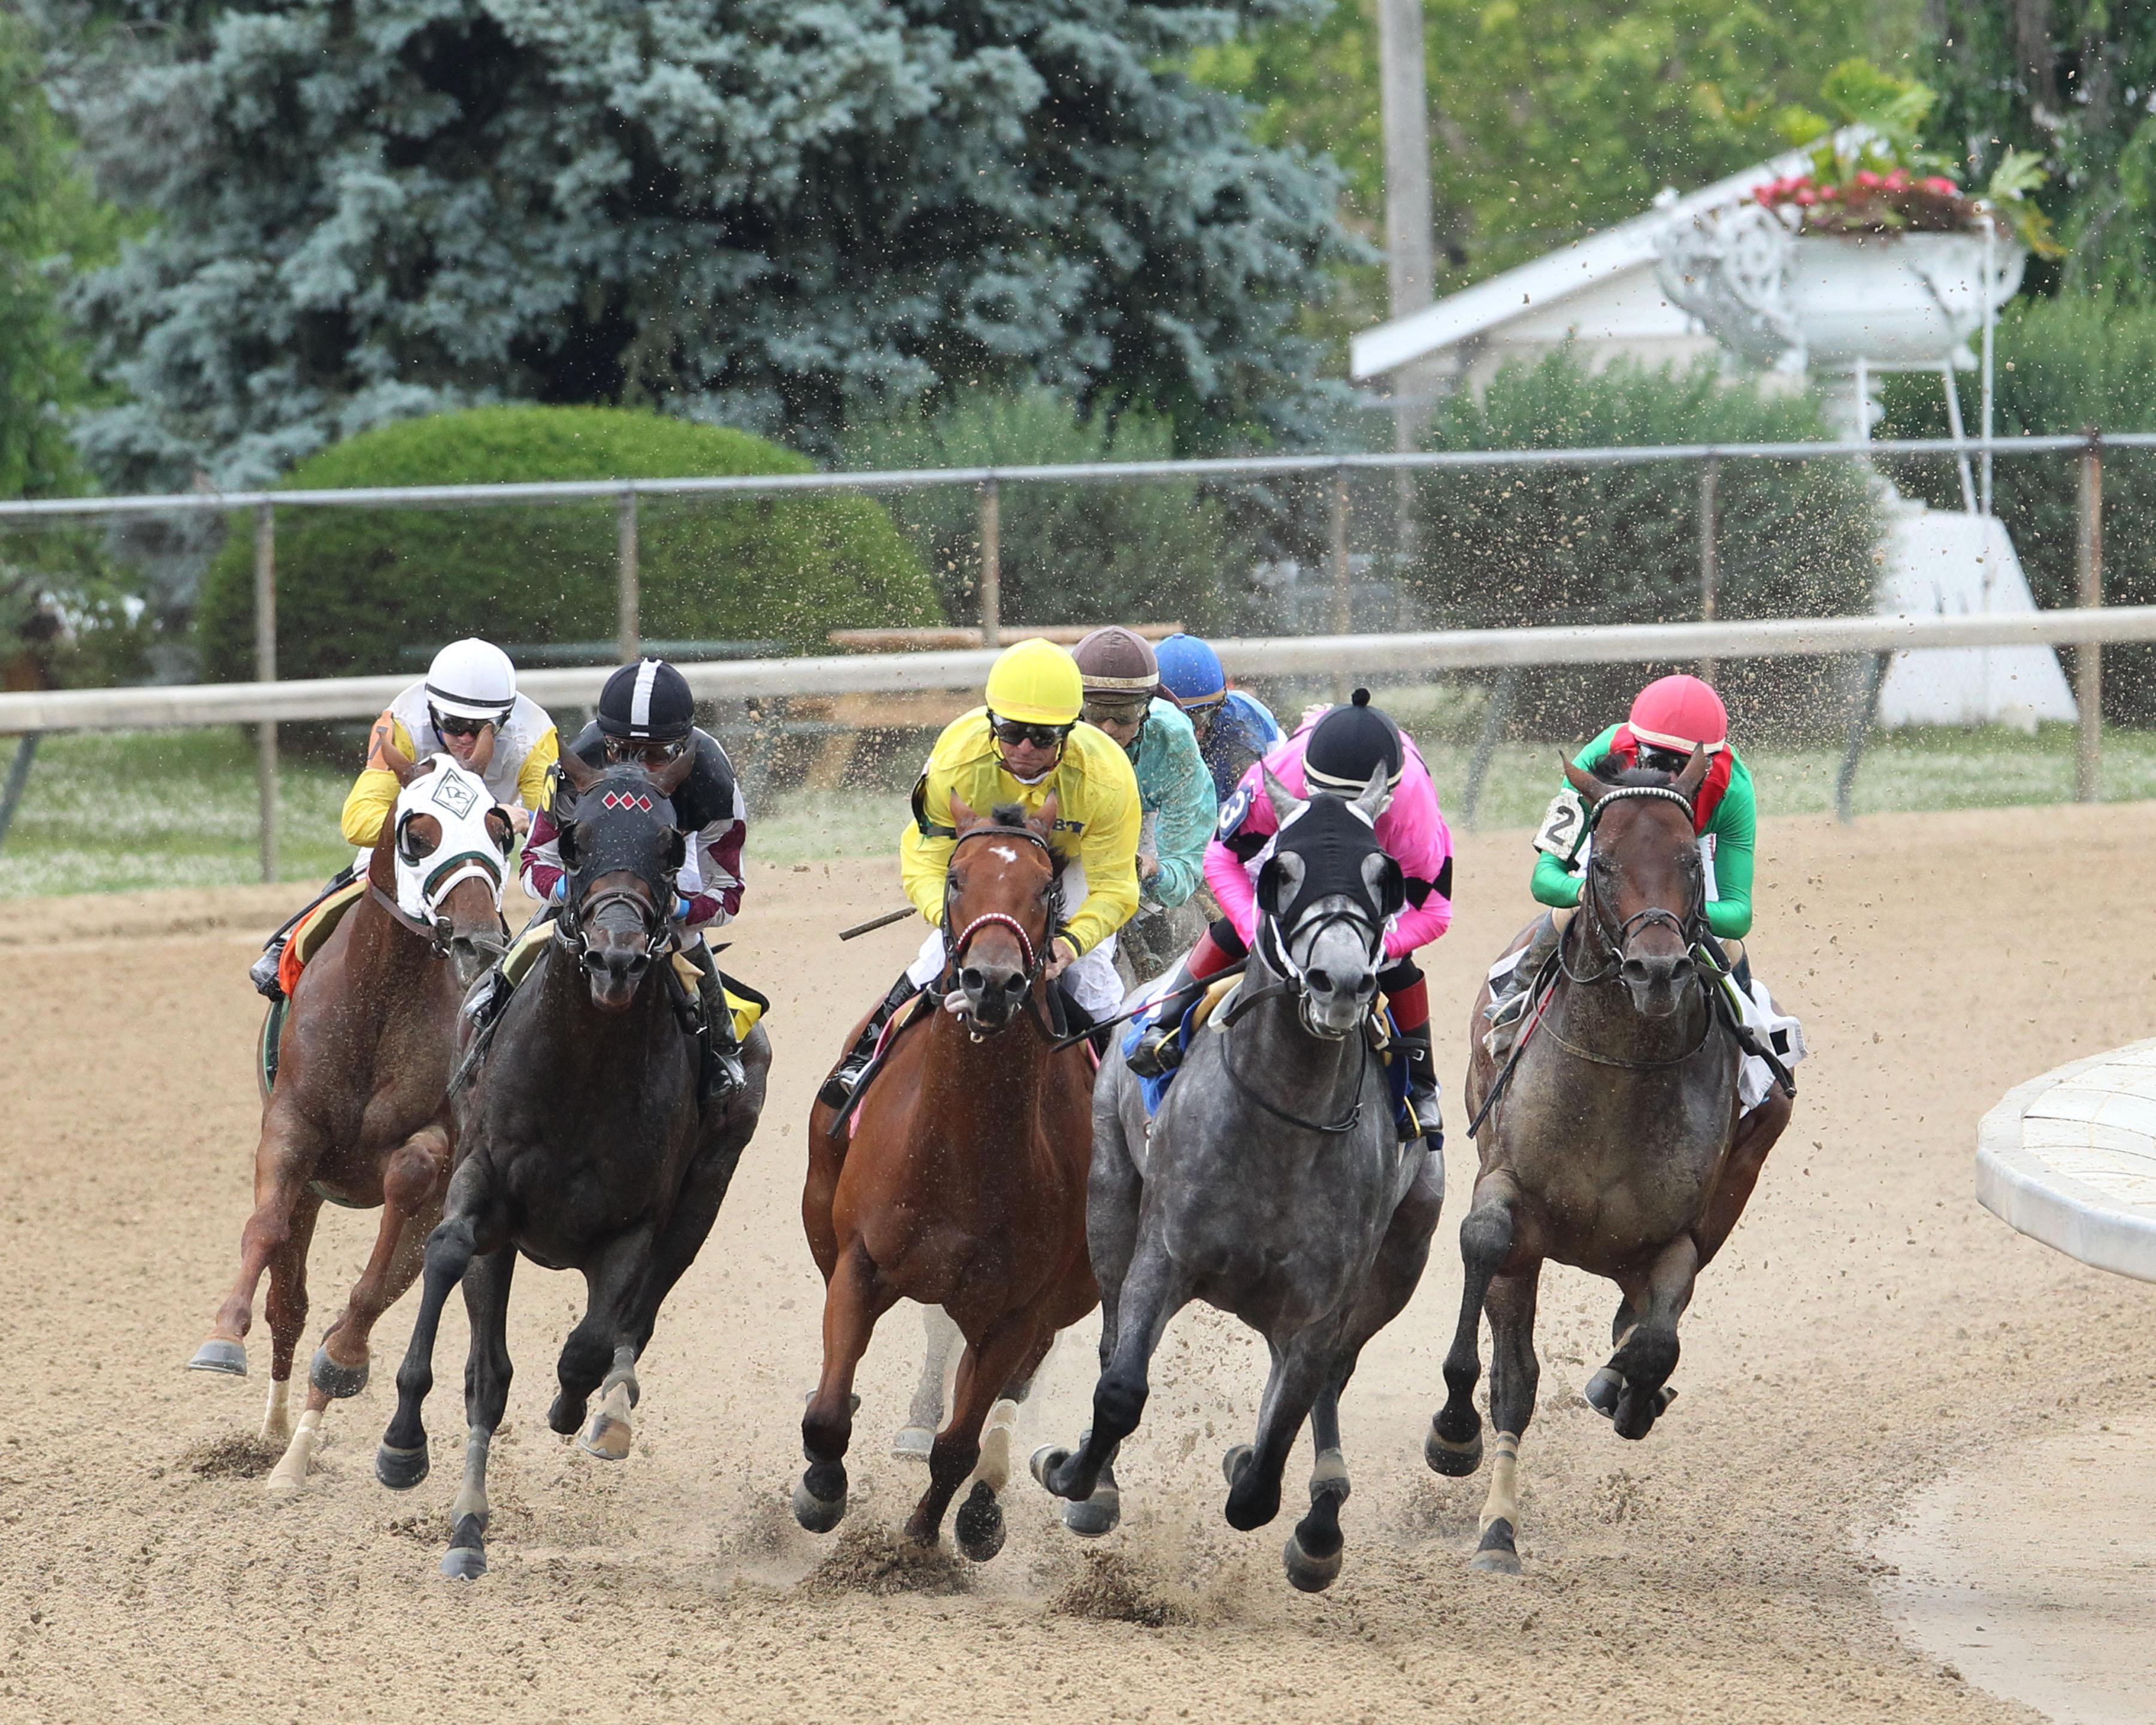 Horses racing at Churchill Downs. (Courtesy of Churchill Downs)